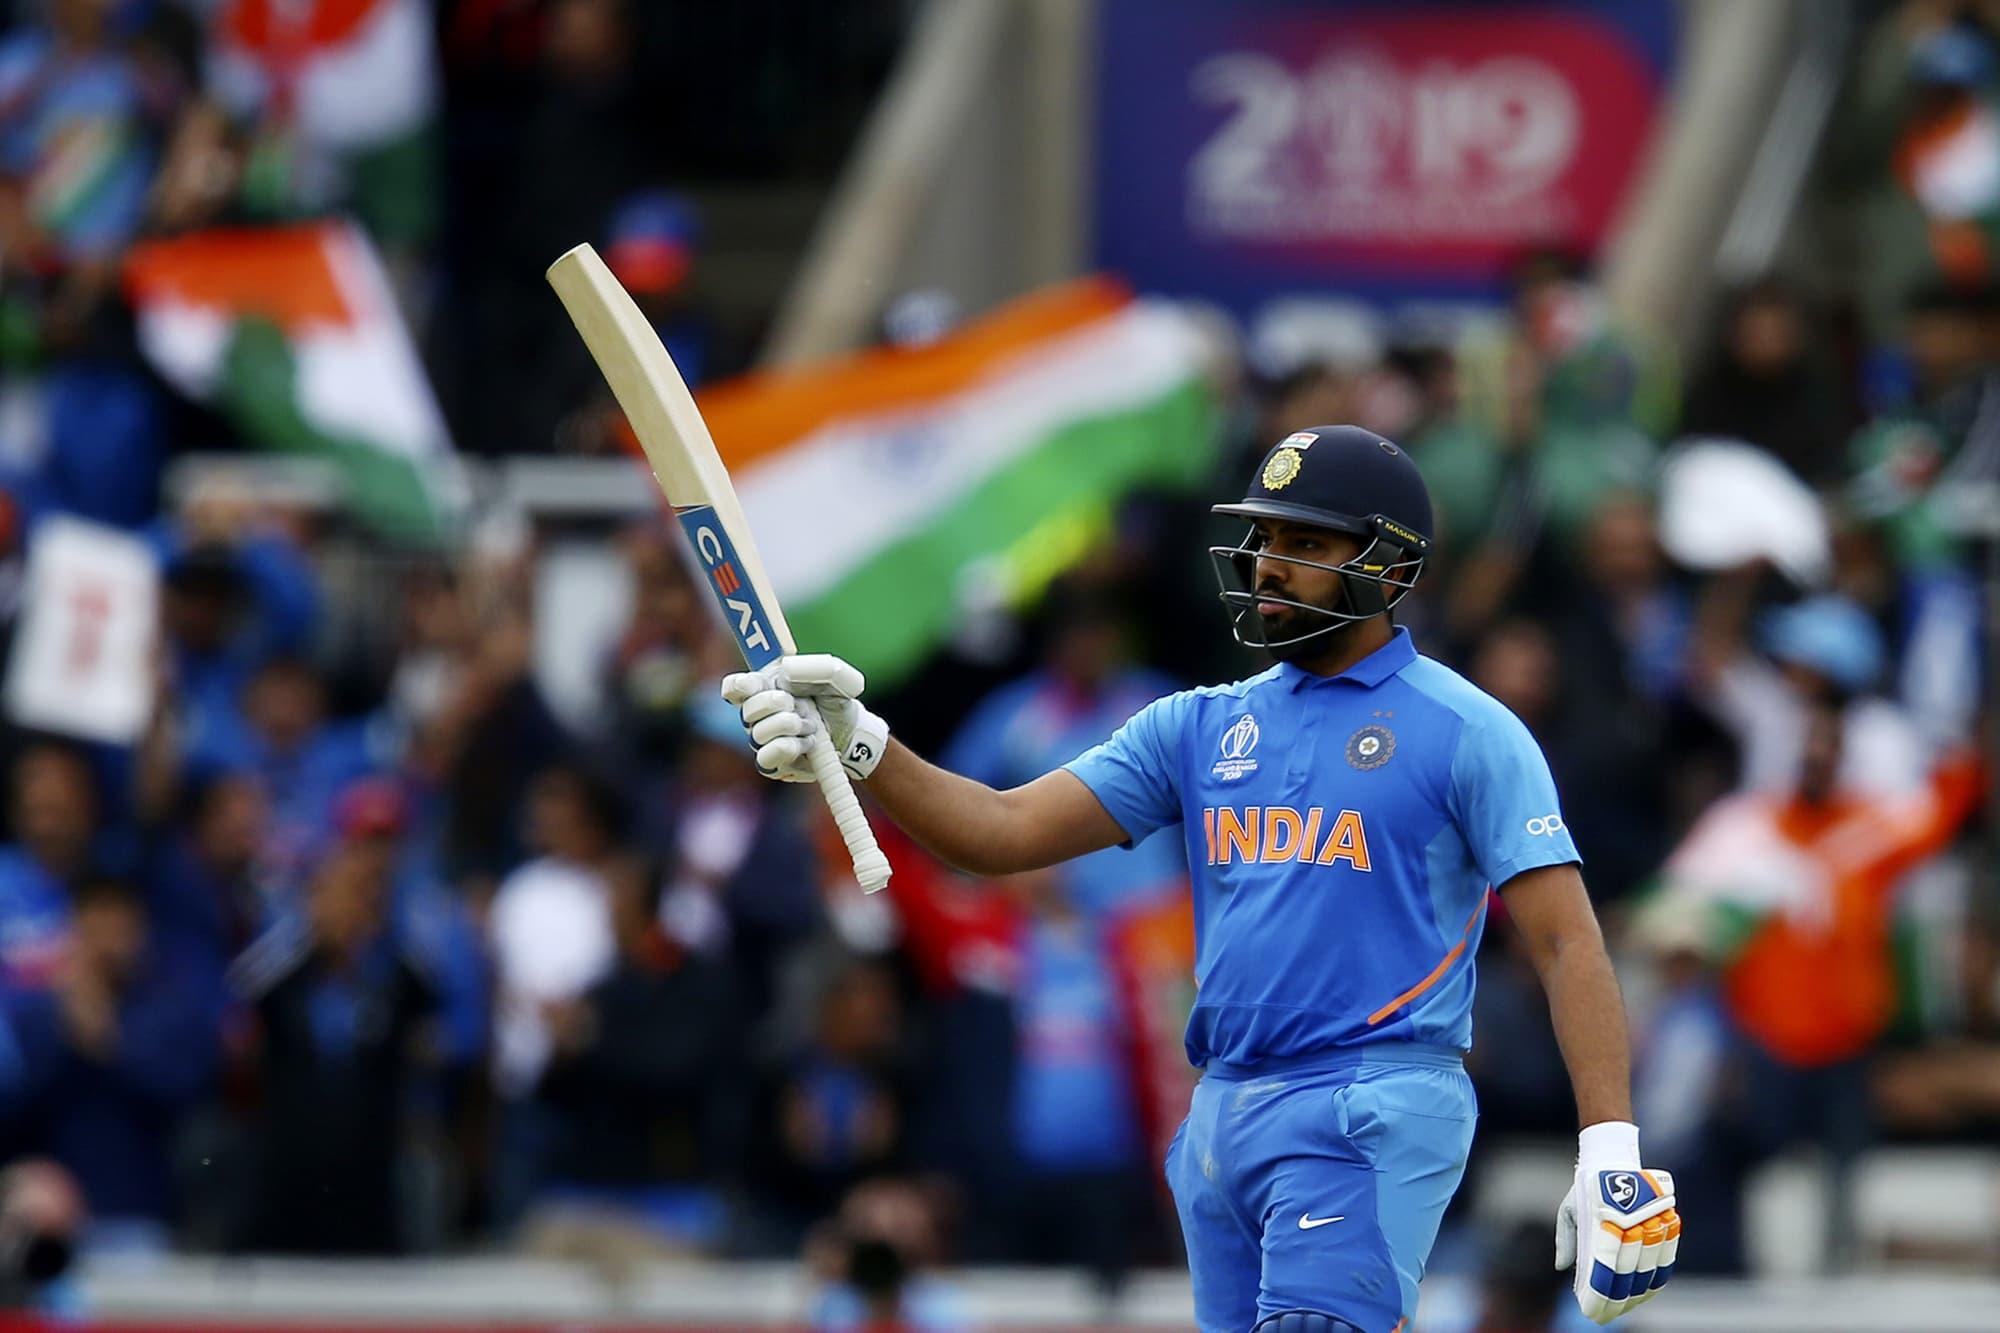 Rahul celebrates reaching a half century. ─ AP